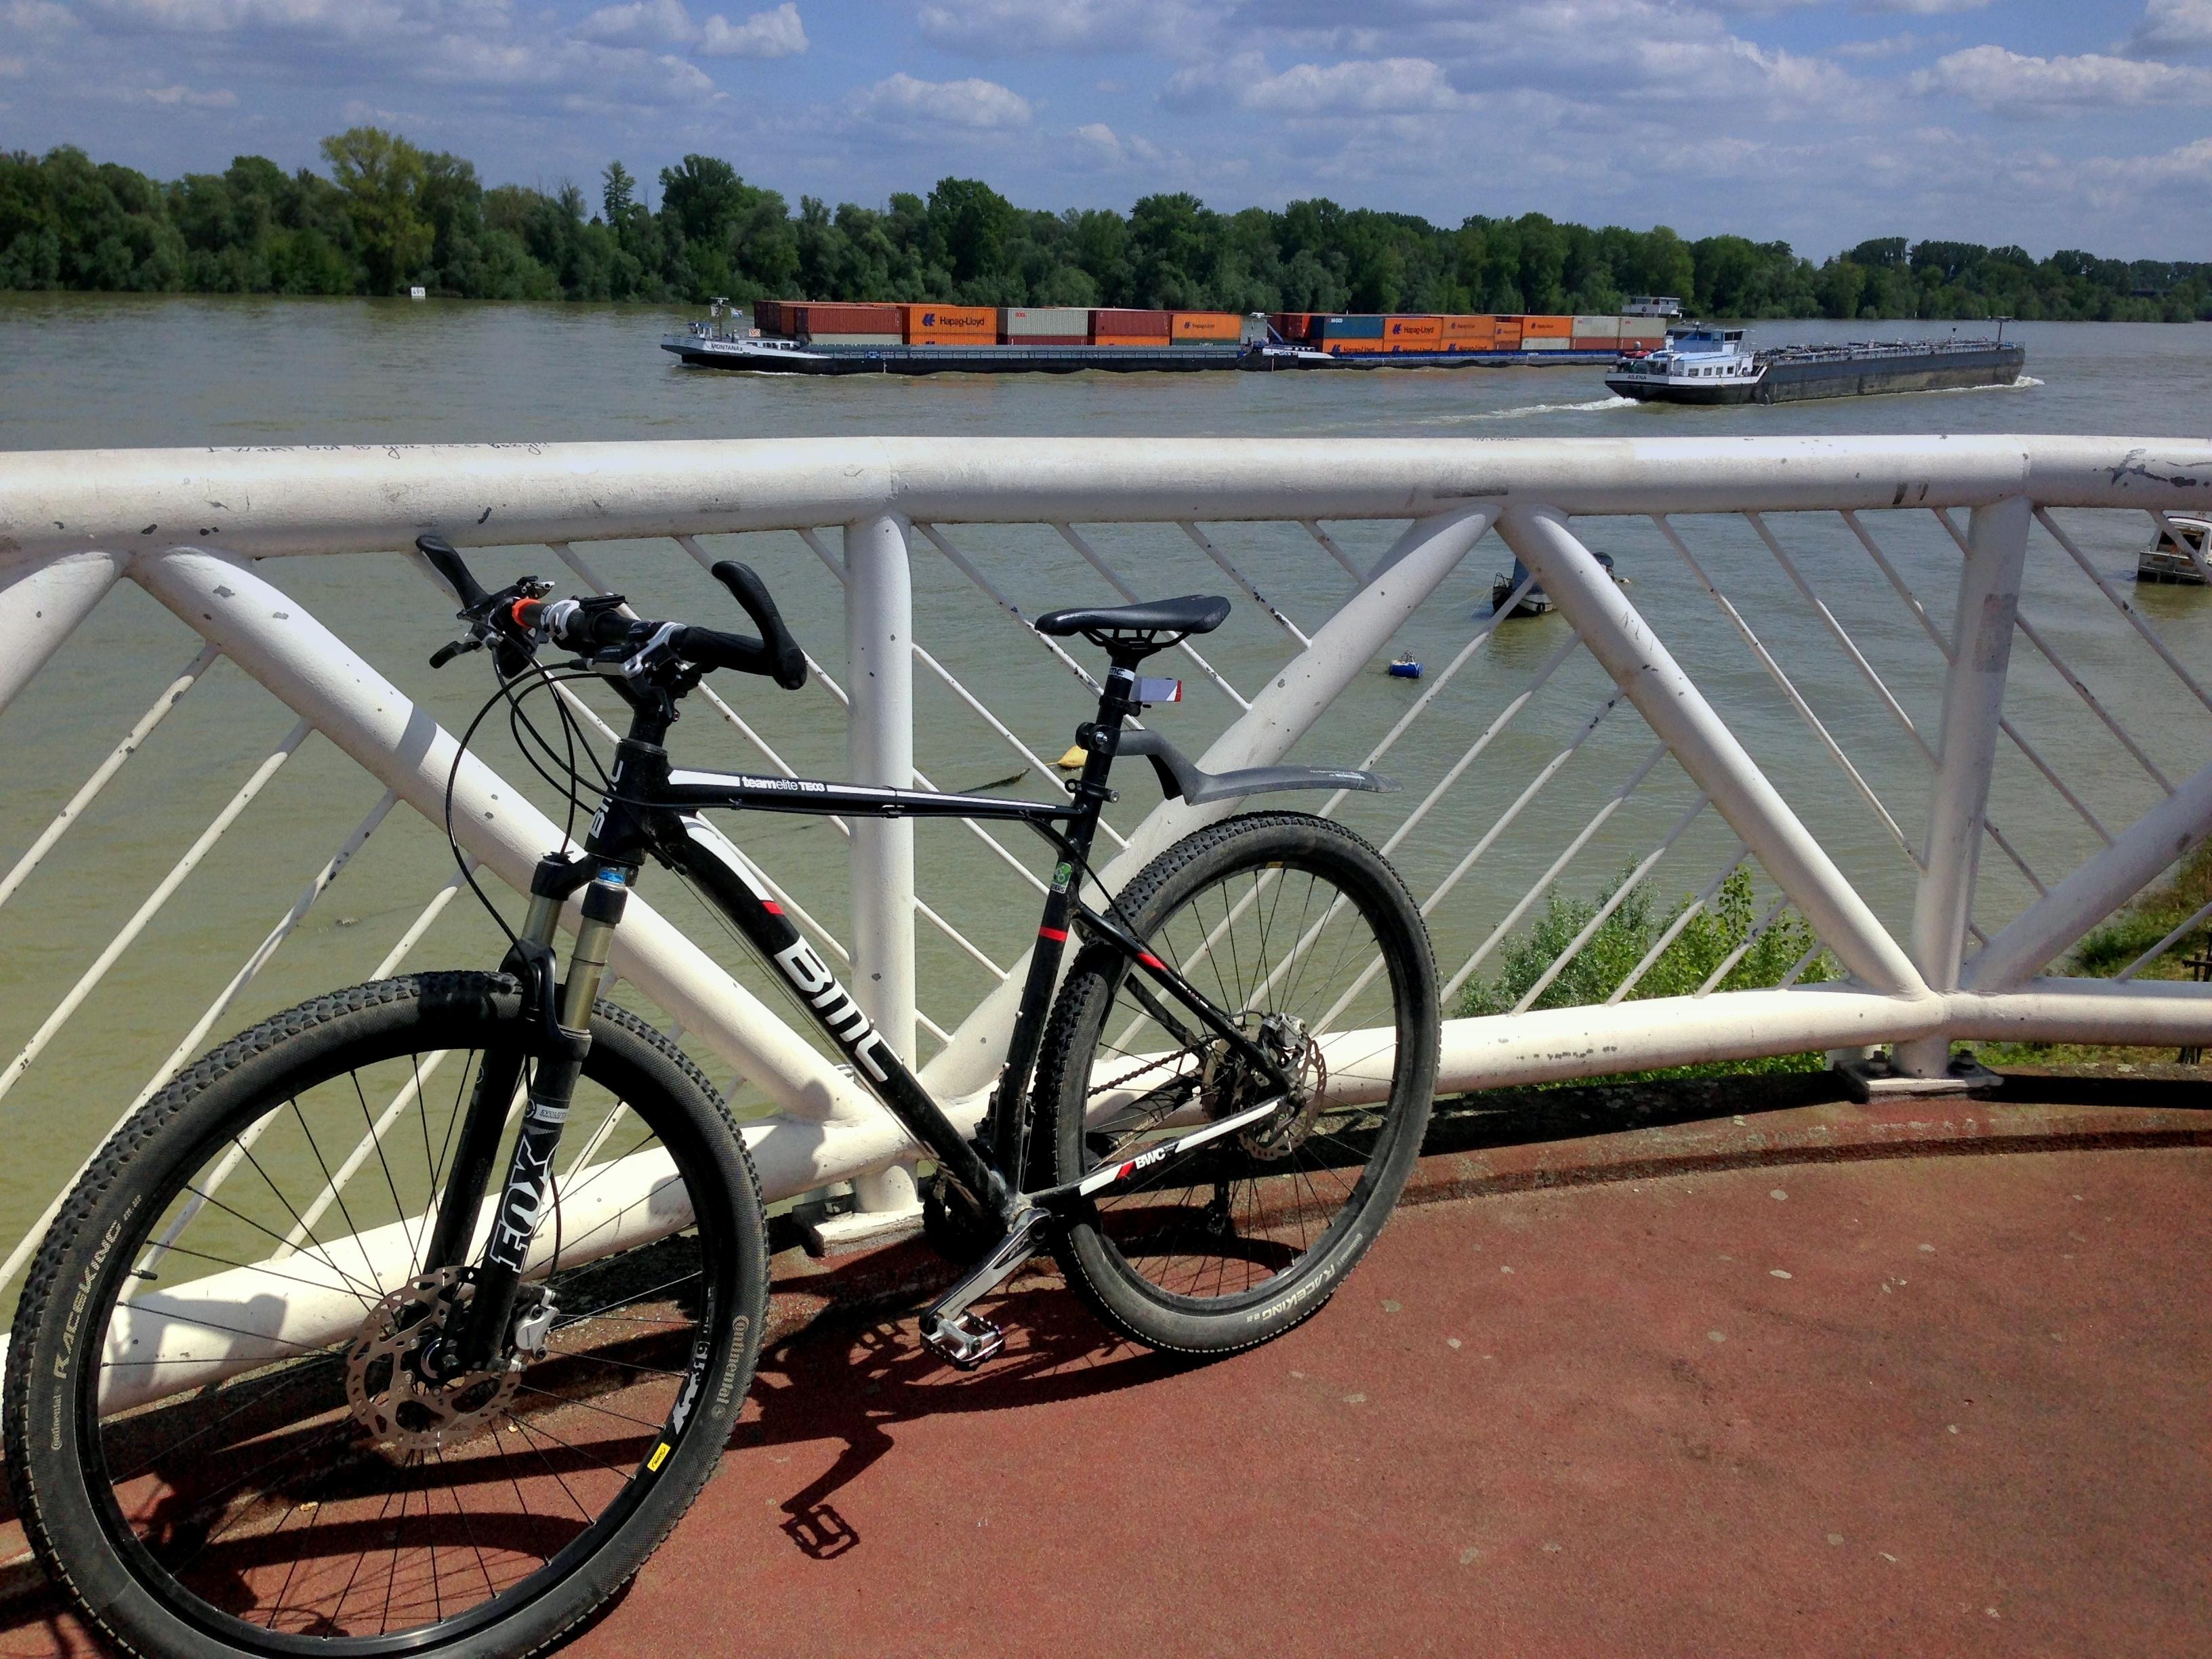 Overlooking the Rhein river